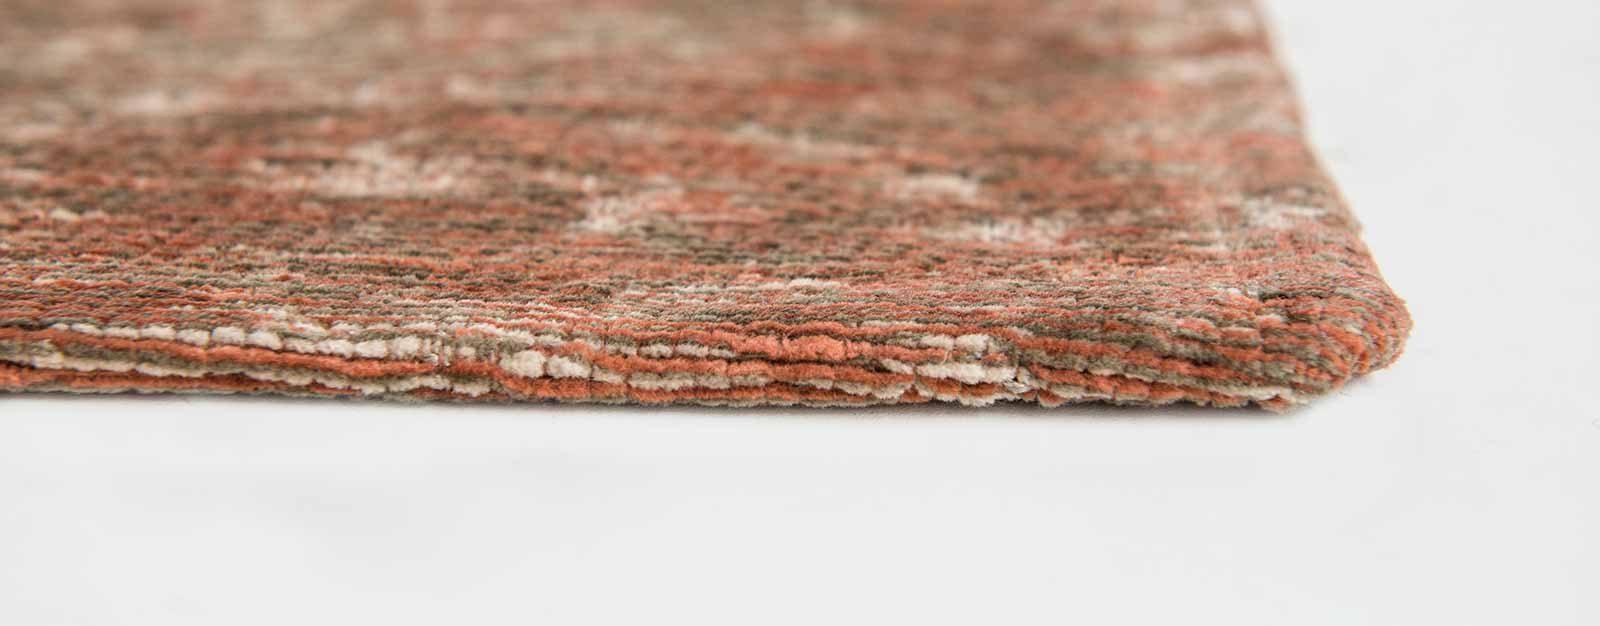 Louis De Poortere alfombras Villa Nova LX 8770 Marka Cognac side